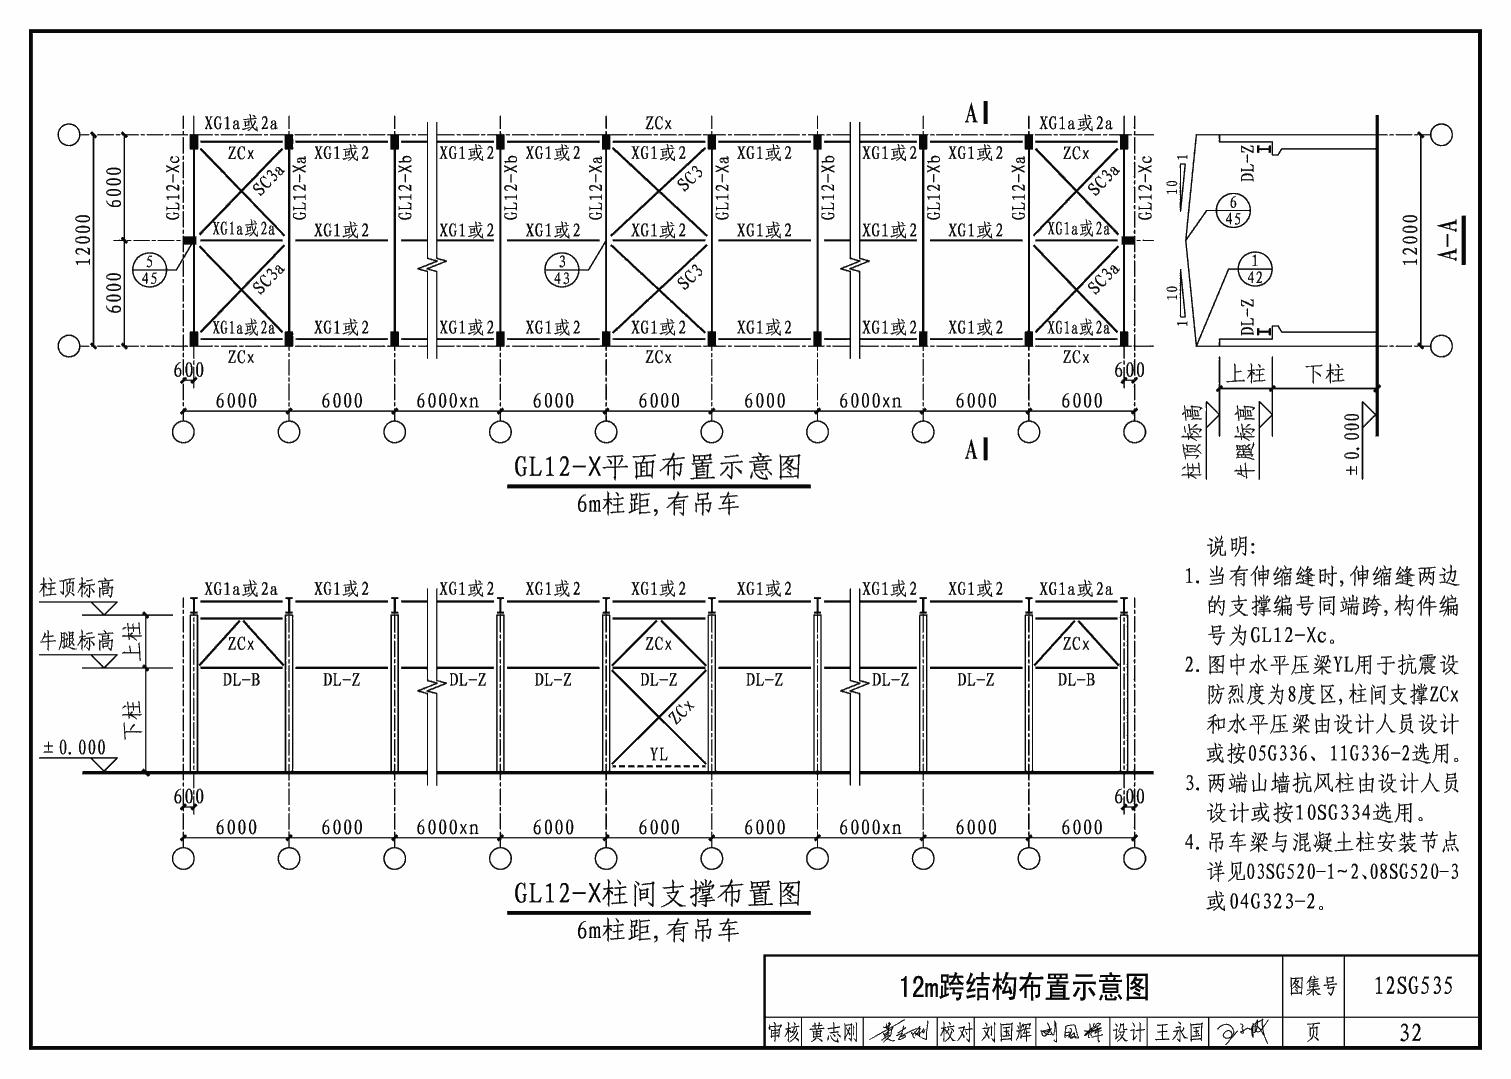 12SG535:实腹国家混凝土柱-钢梁建筑标准设大全v国家观后感字体图片